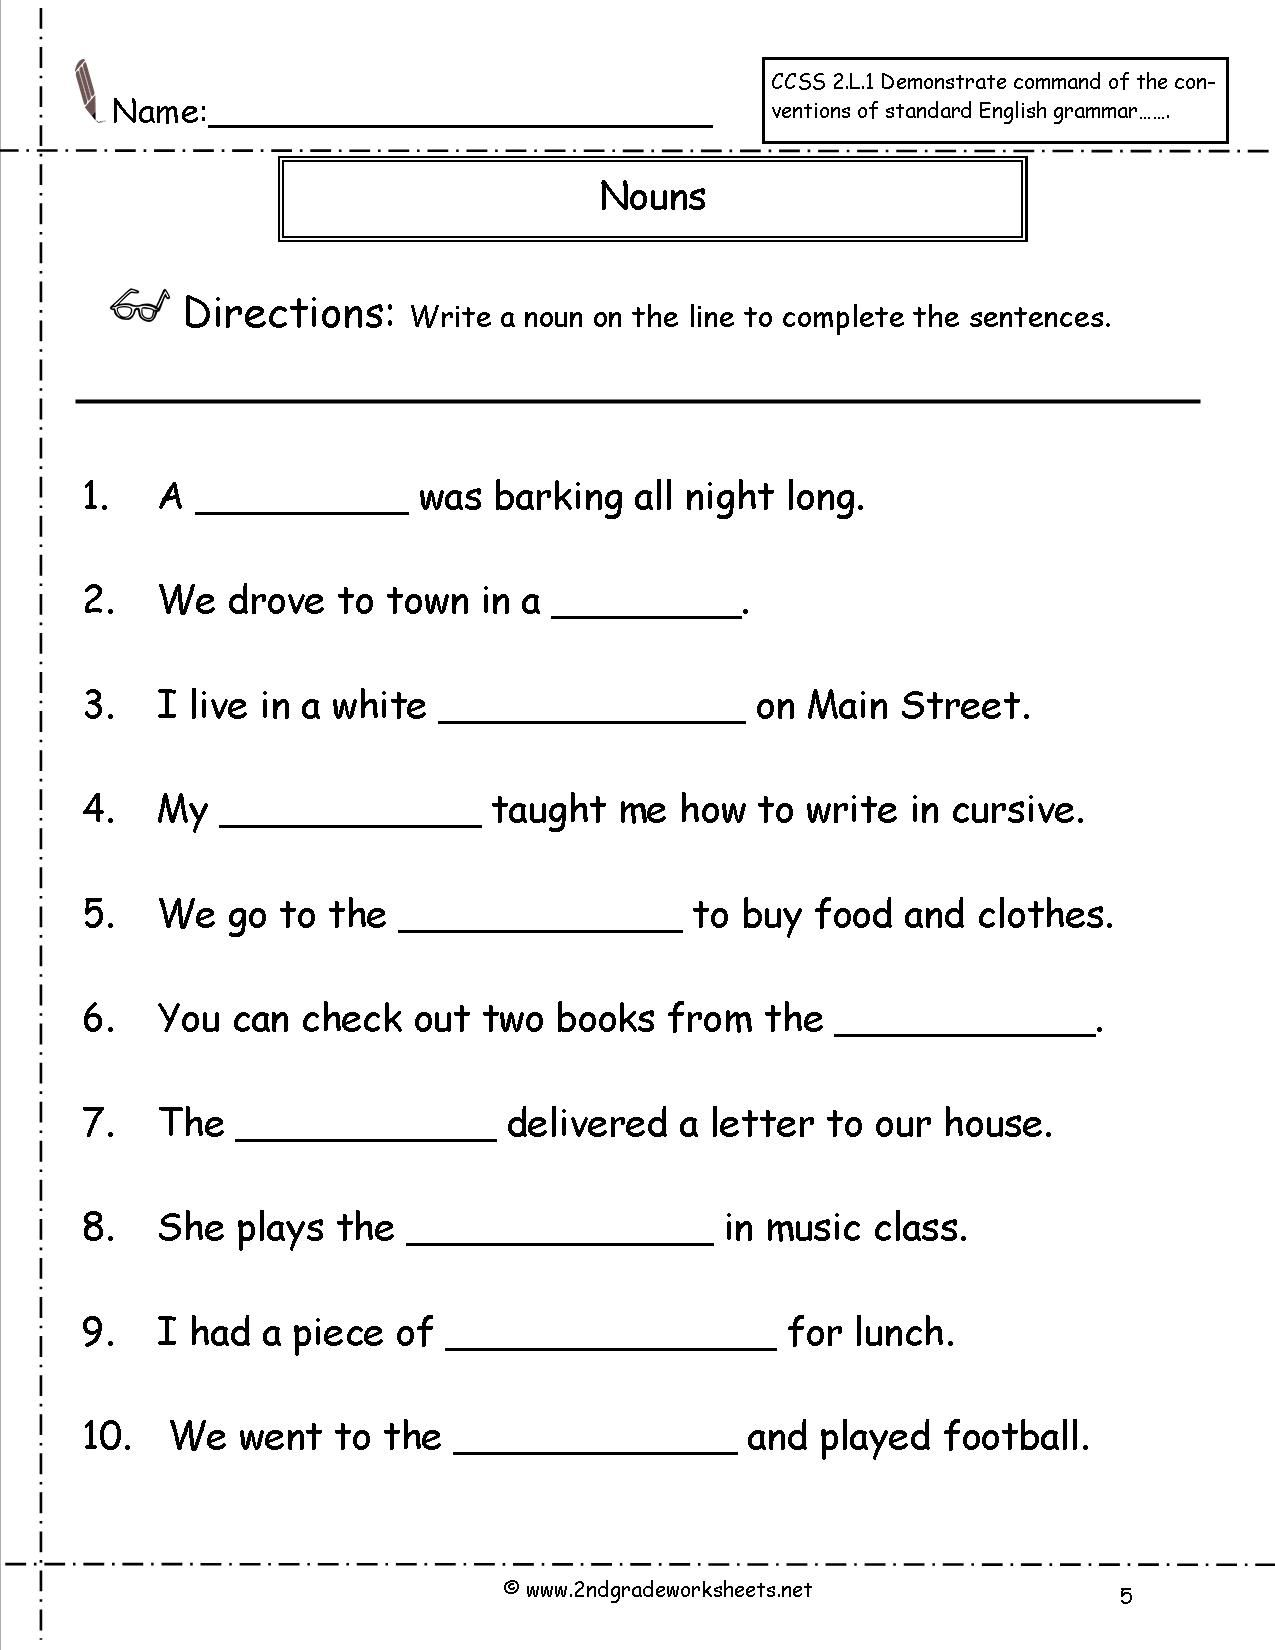 12 Best Noun Worksheets For 3rd Grade Printable Images On